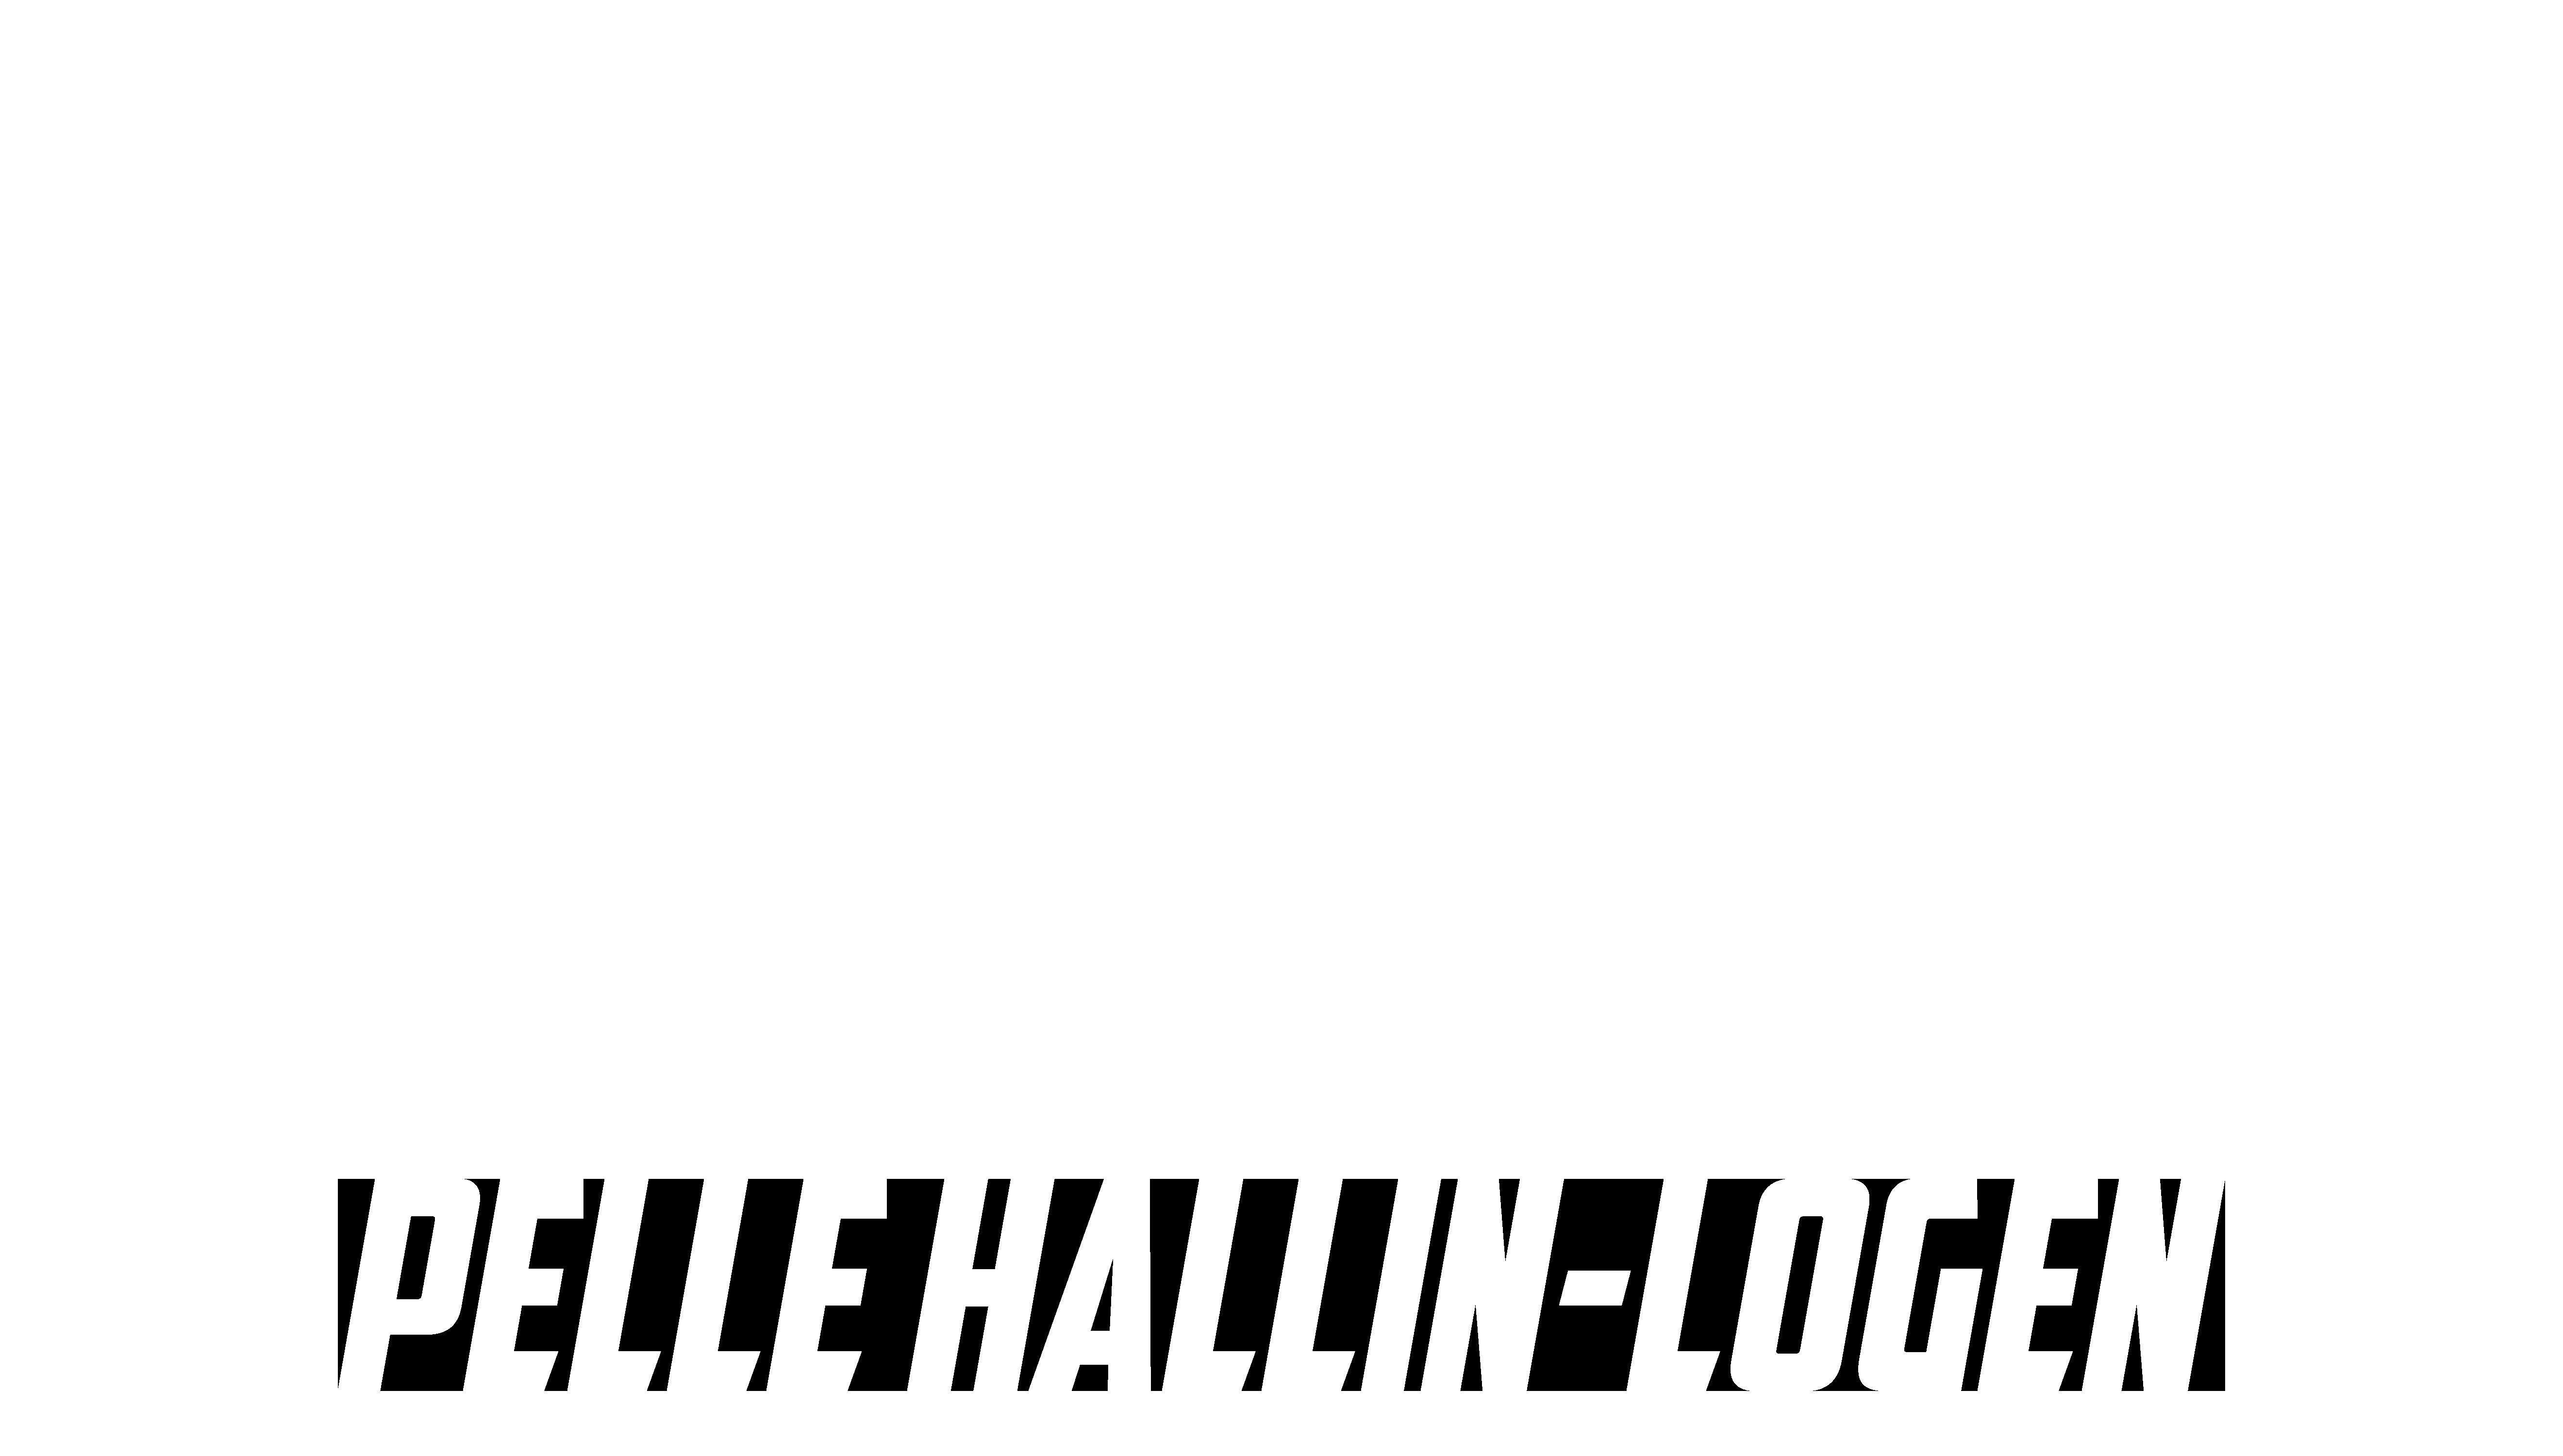 Per Hallin-Logen